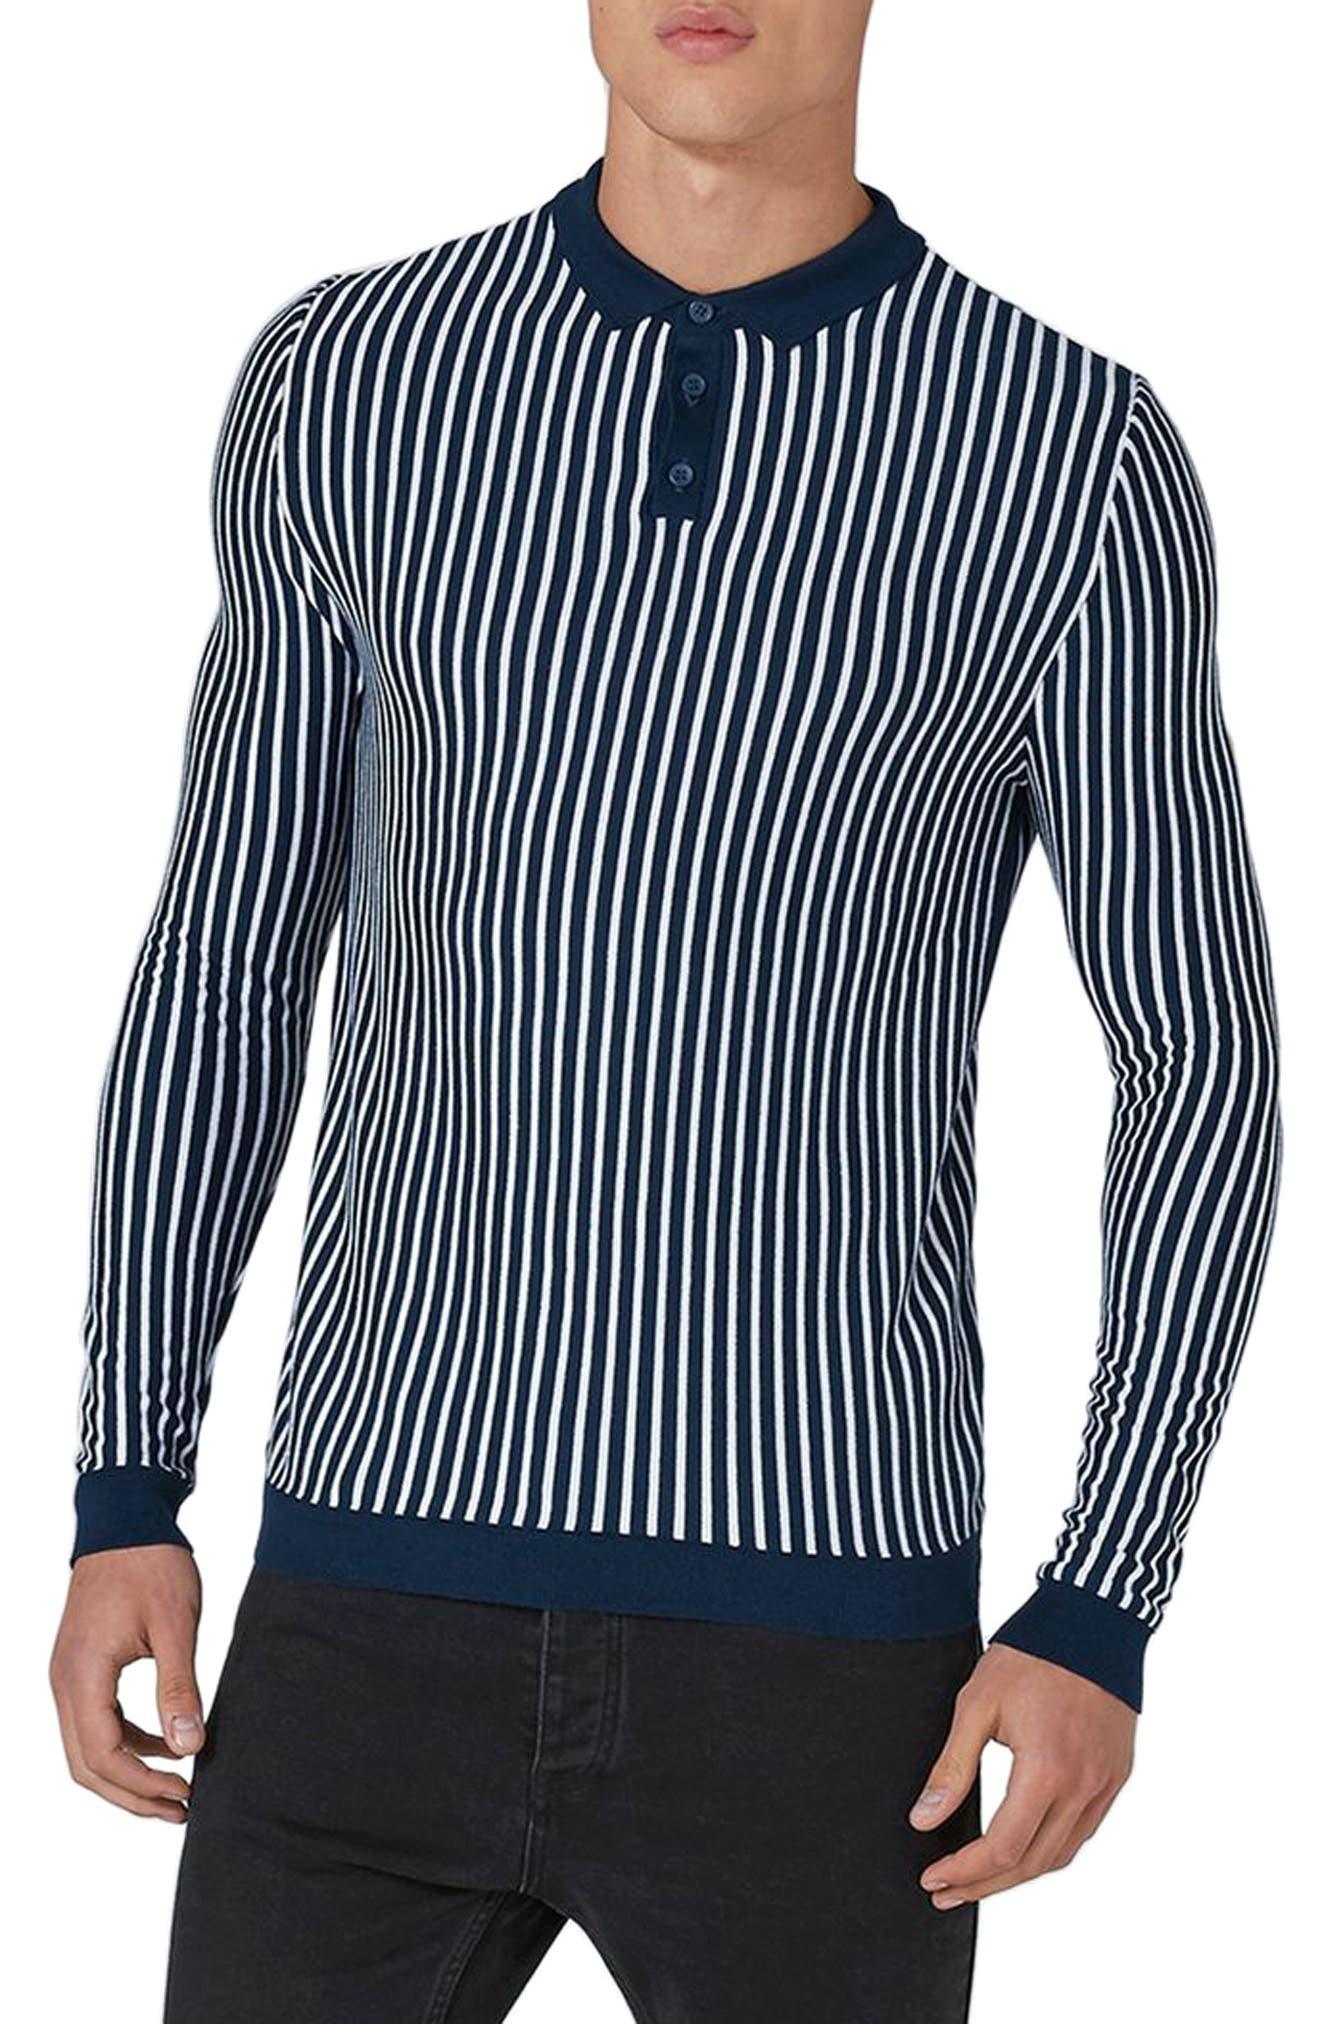 Stripe Knit Polo Sweater,                         Main,                         color, Navy Blue Multi